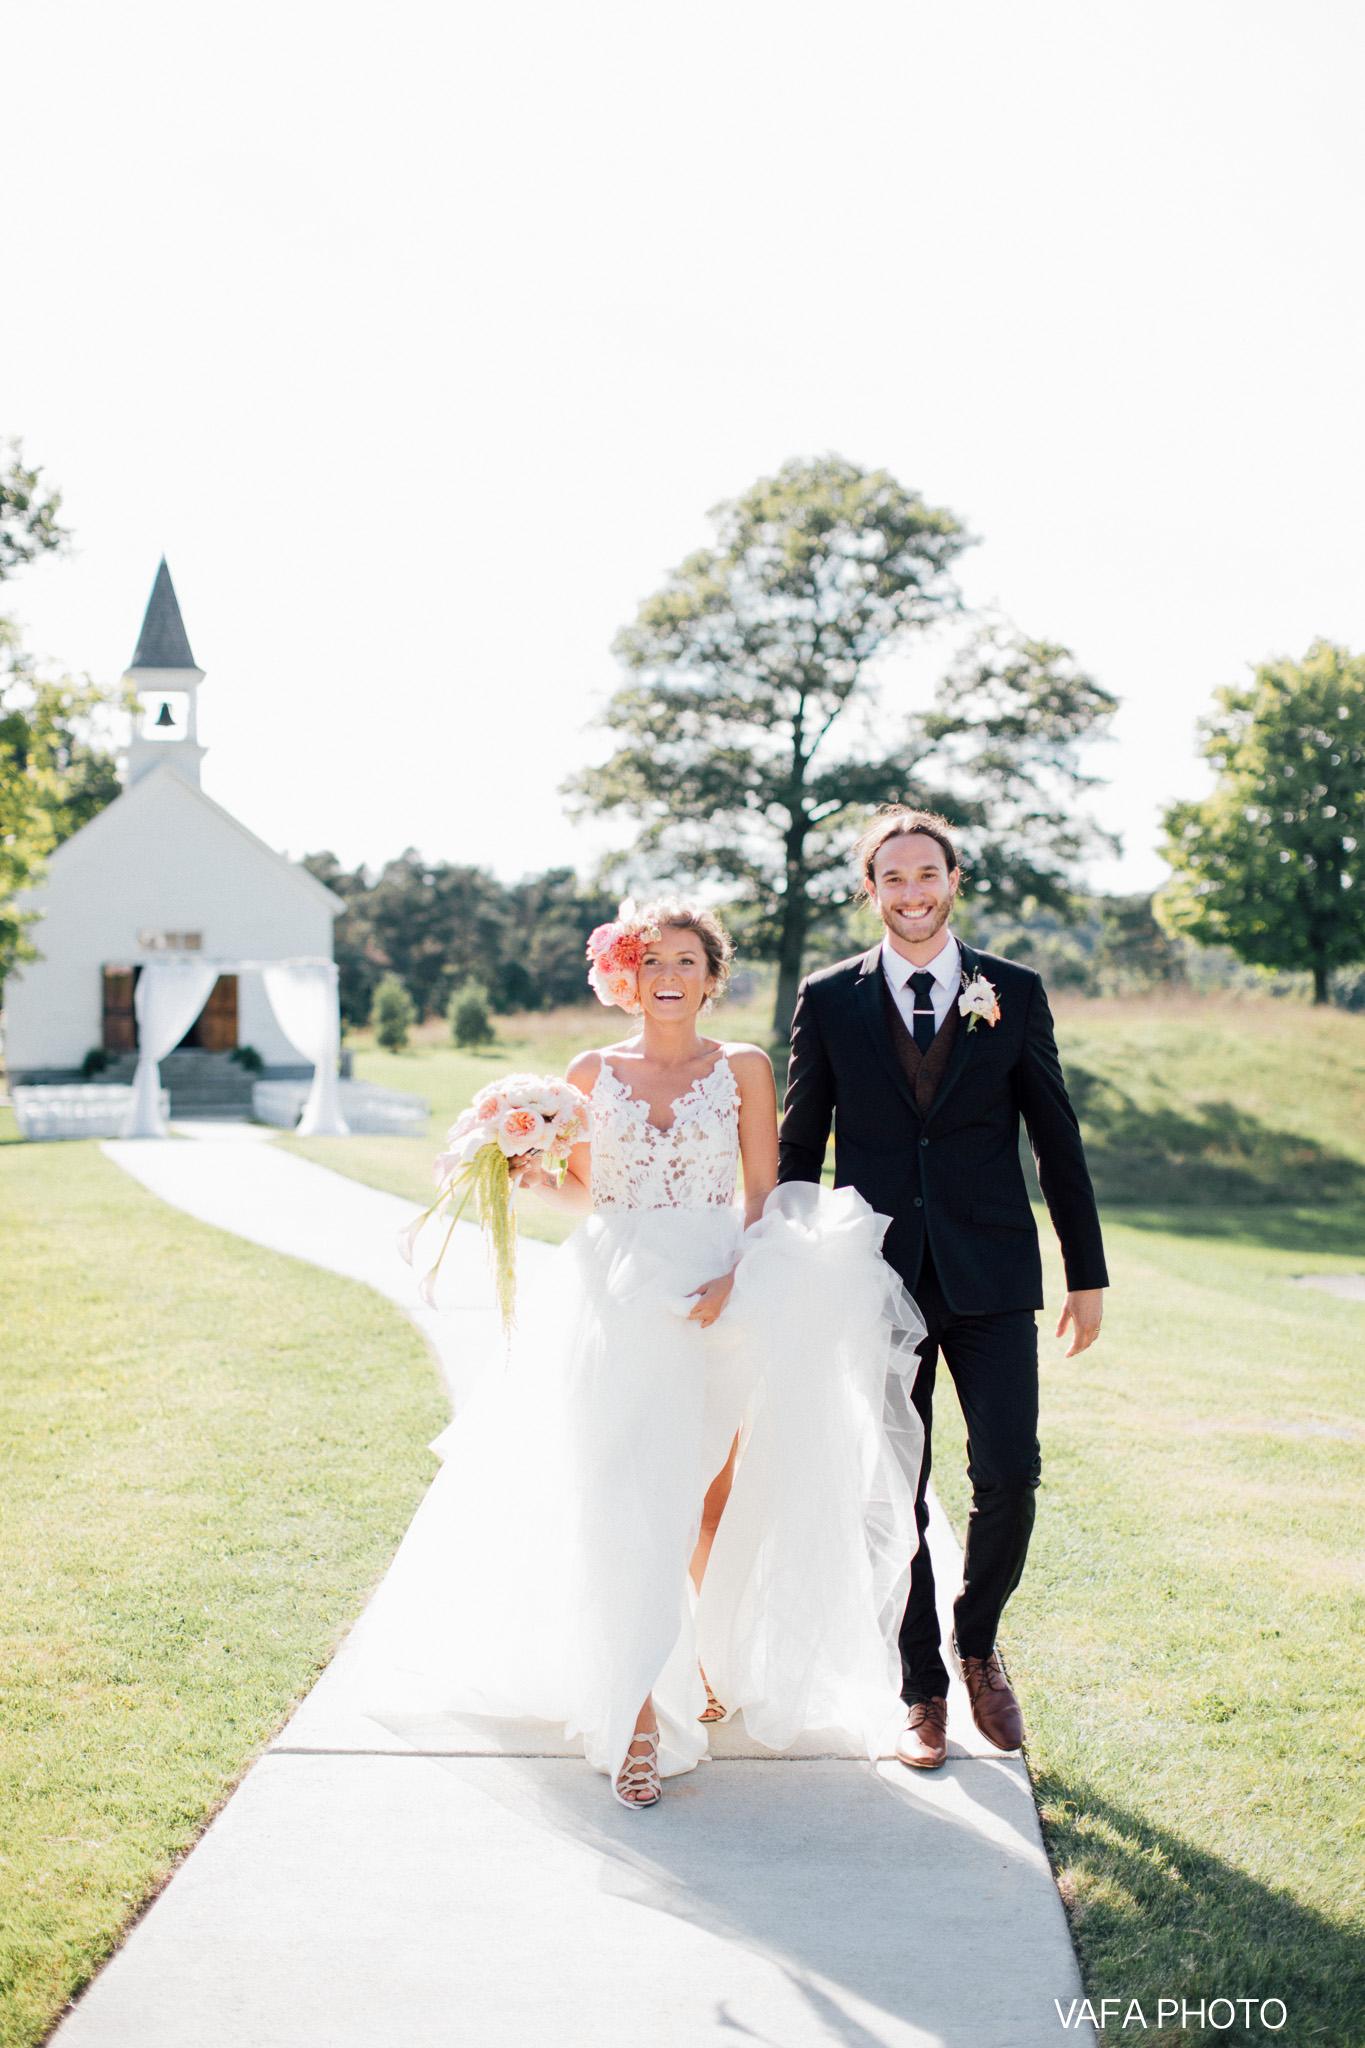 The-Felt-Estate-Wedding-Kailie-David-Vafa-Photo-586.jpg